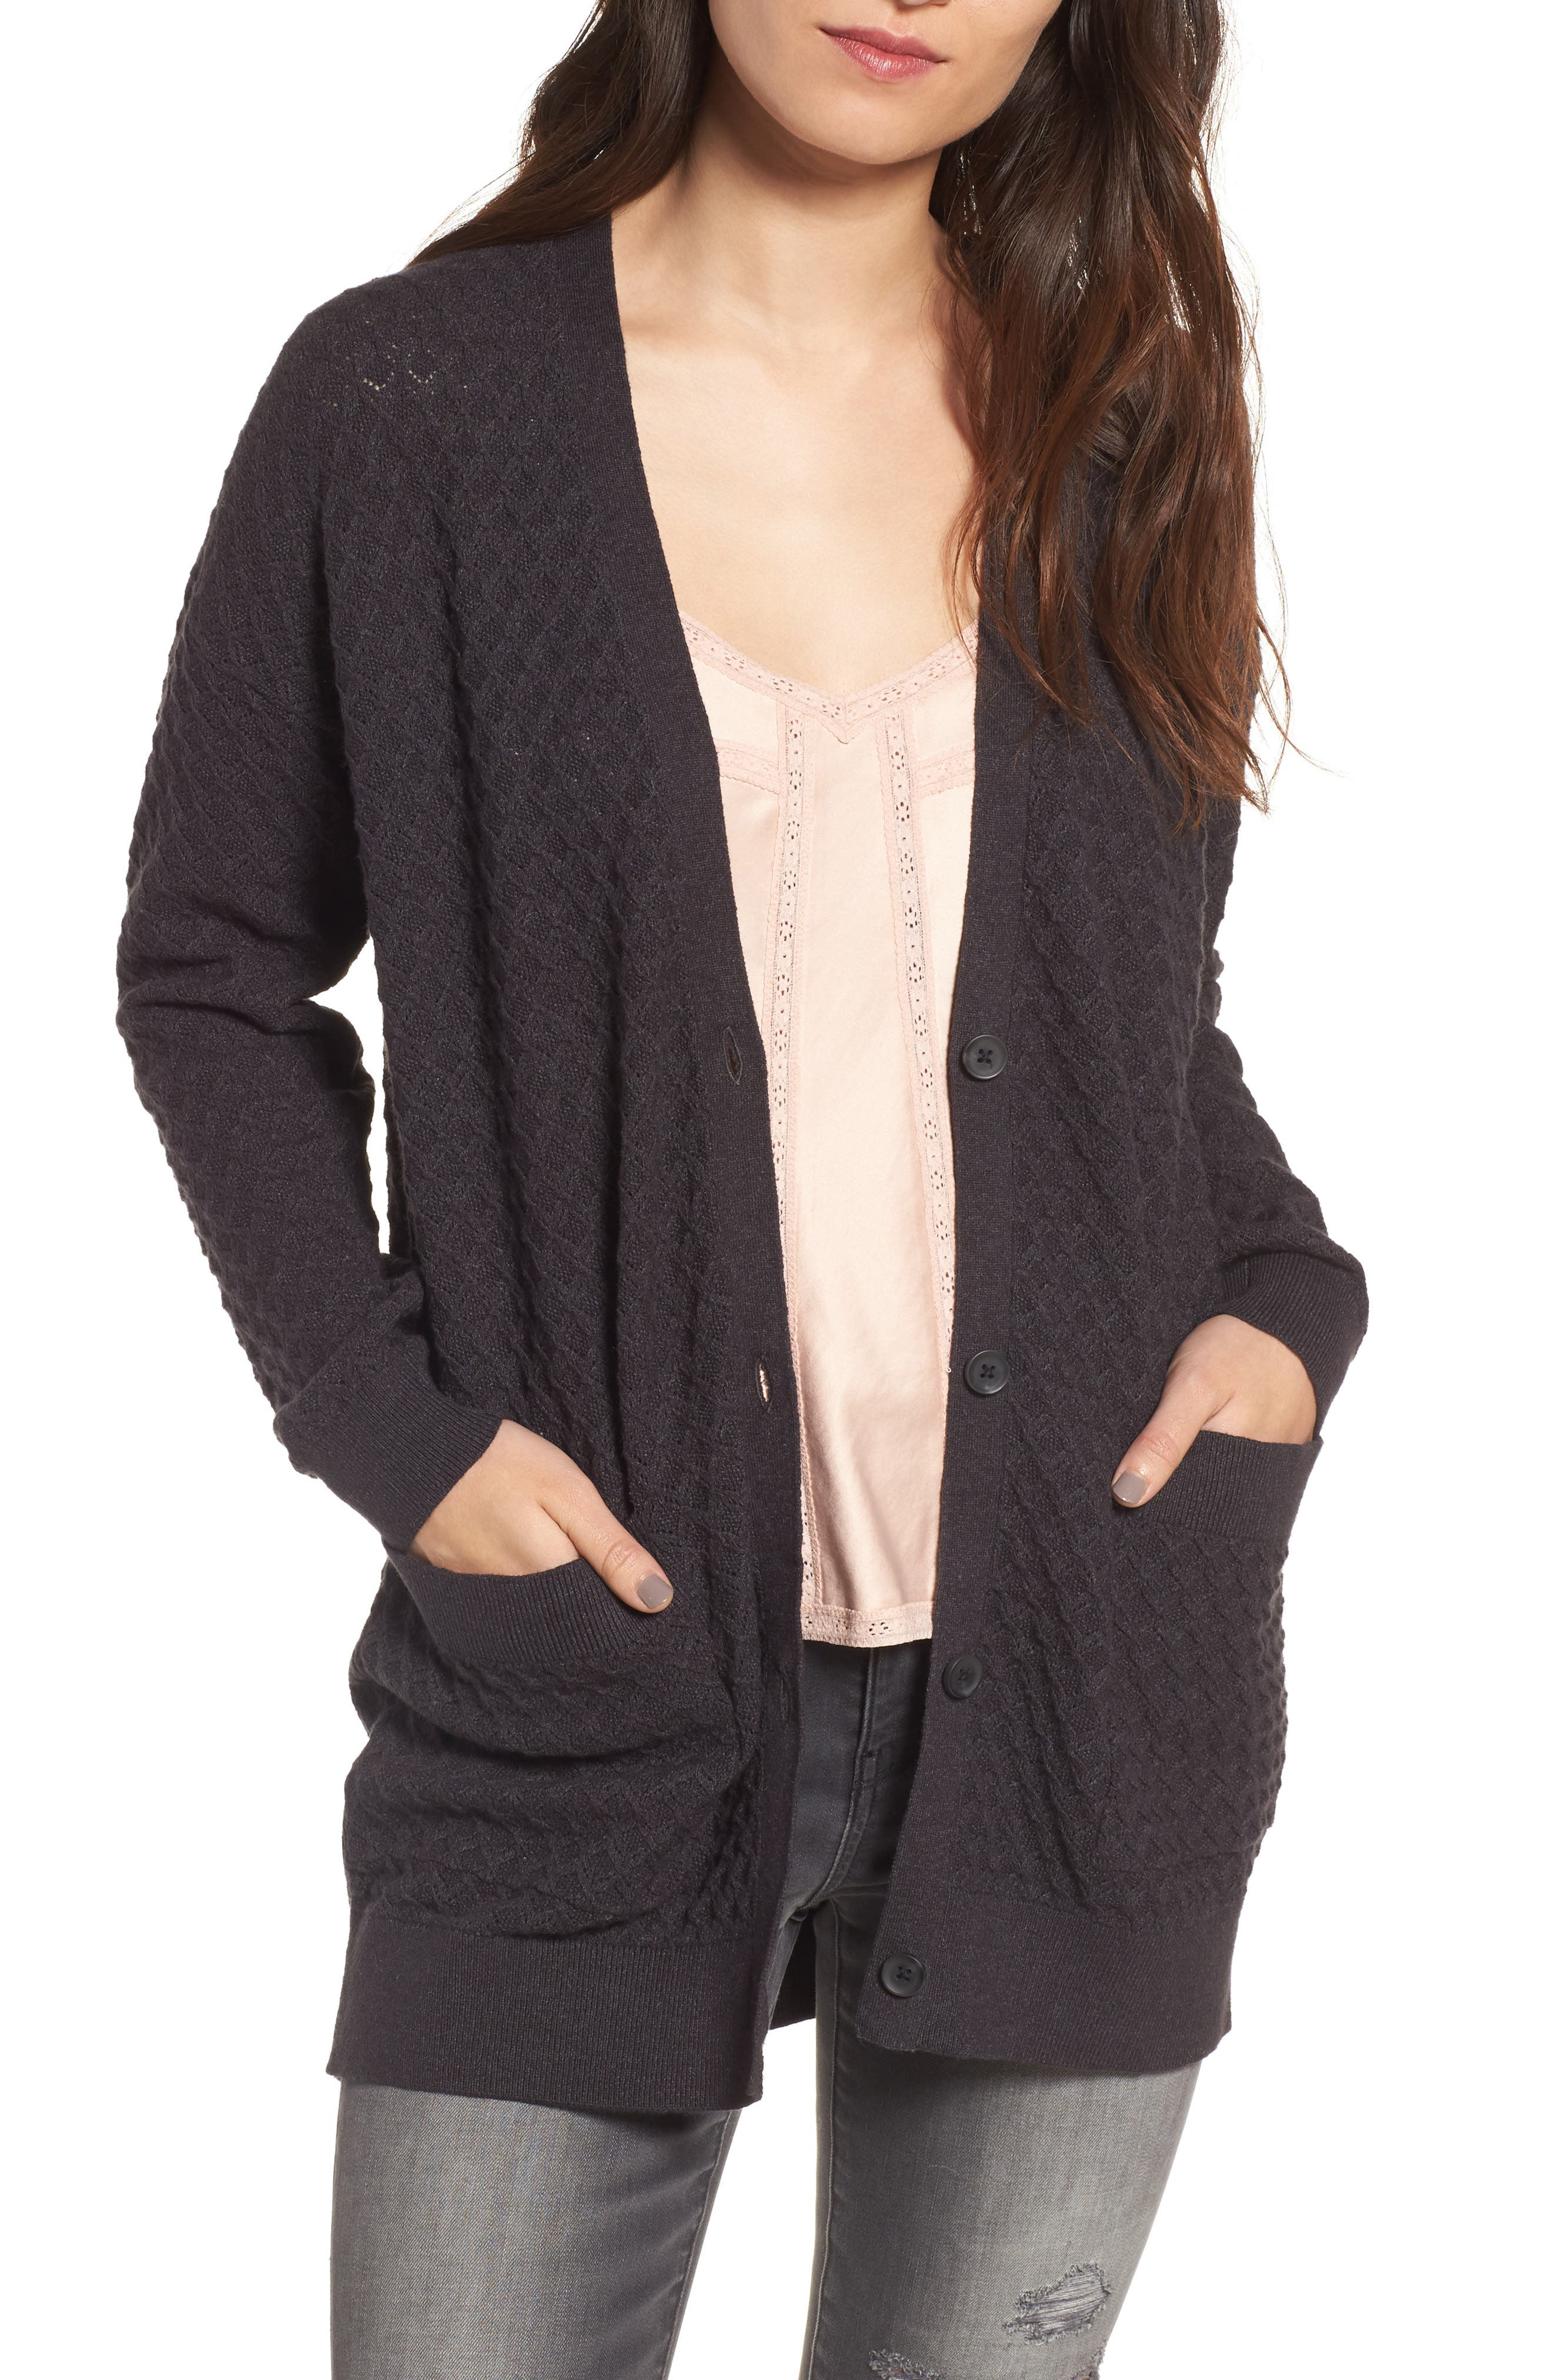 Hinge Pointelle Cardigan Sweater